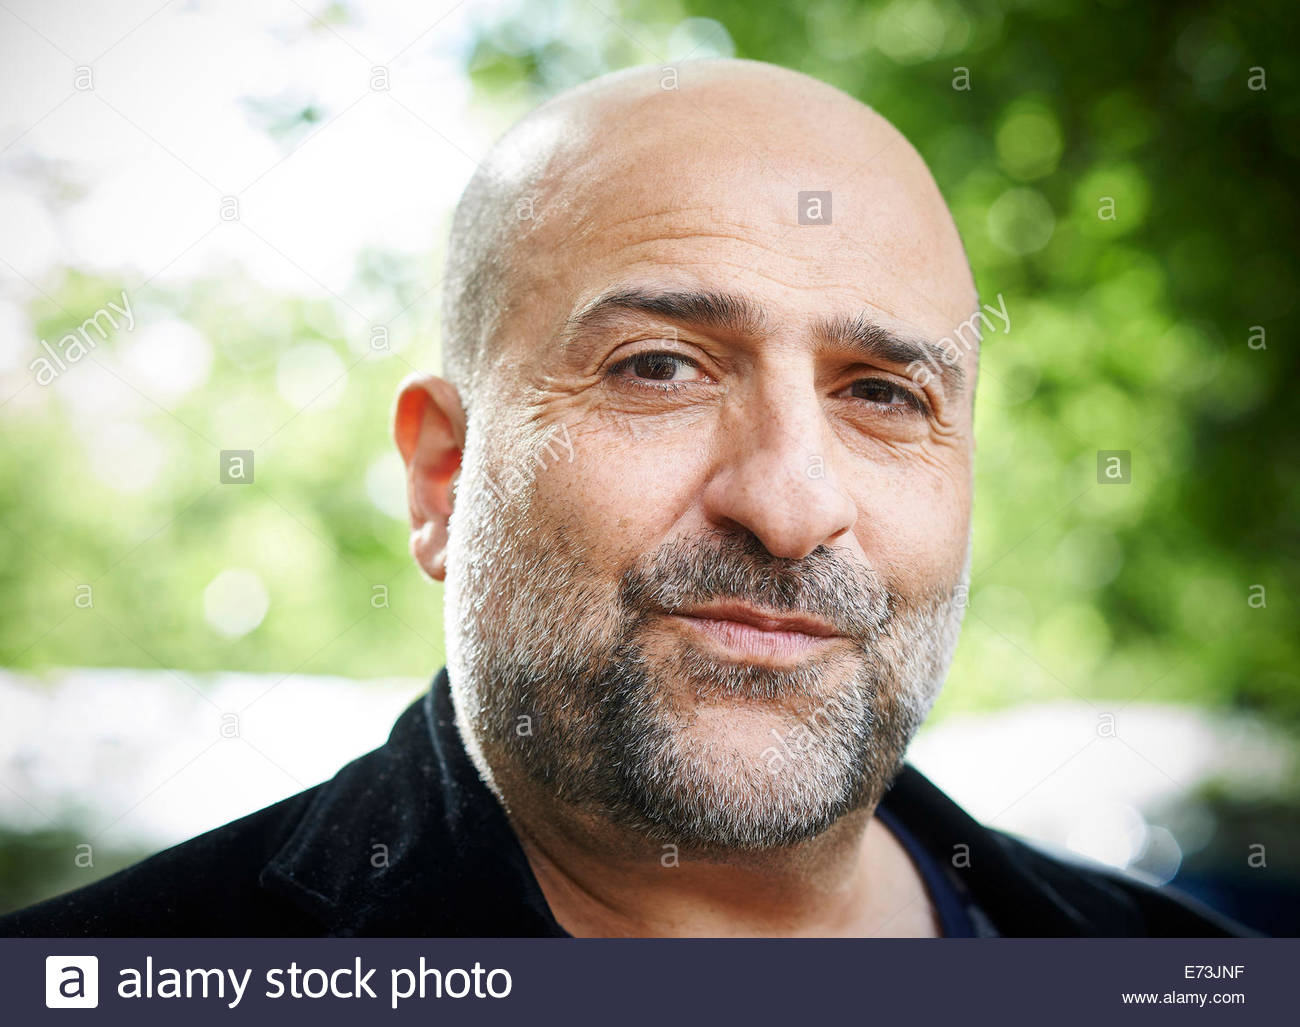 Omid Djalili, commedian, actor  and writer  at Edinburgh International Book Festival  Literary Festival  2014 - Stock Image